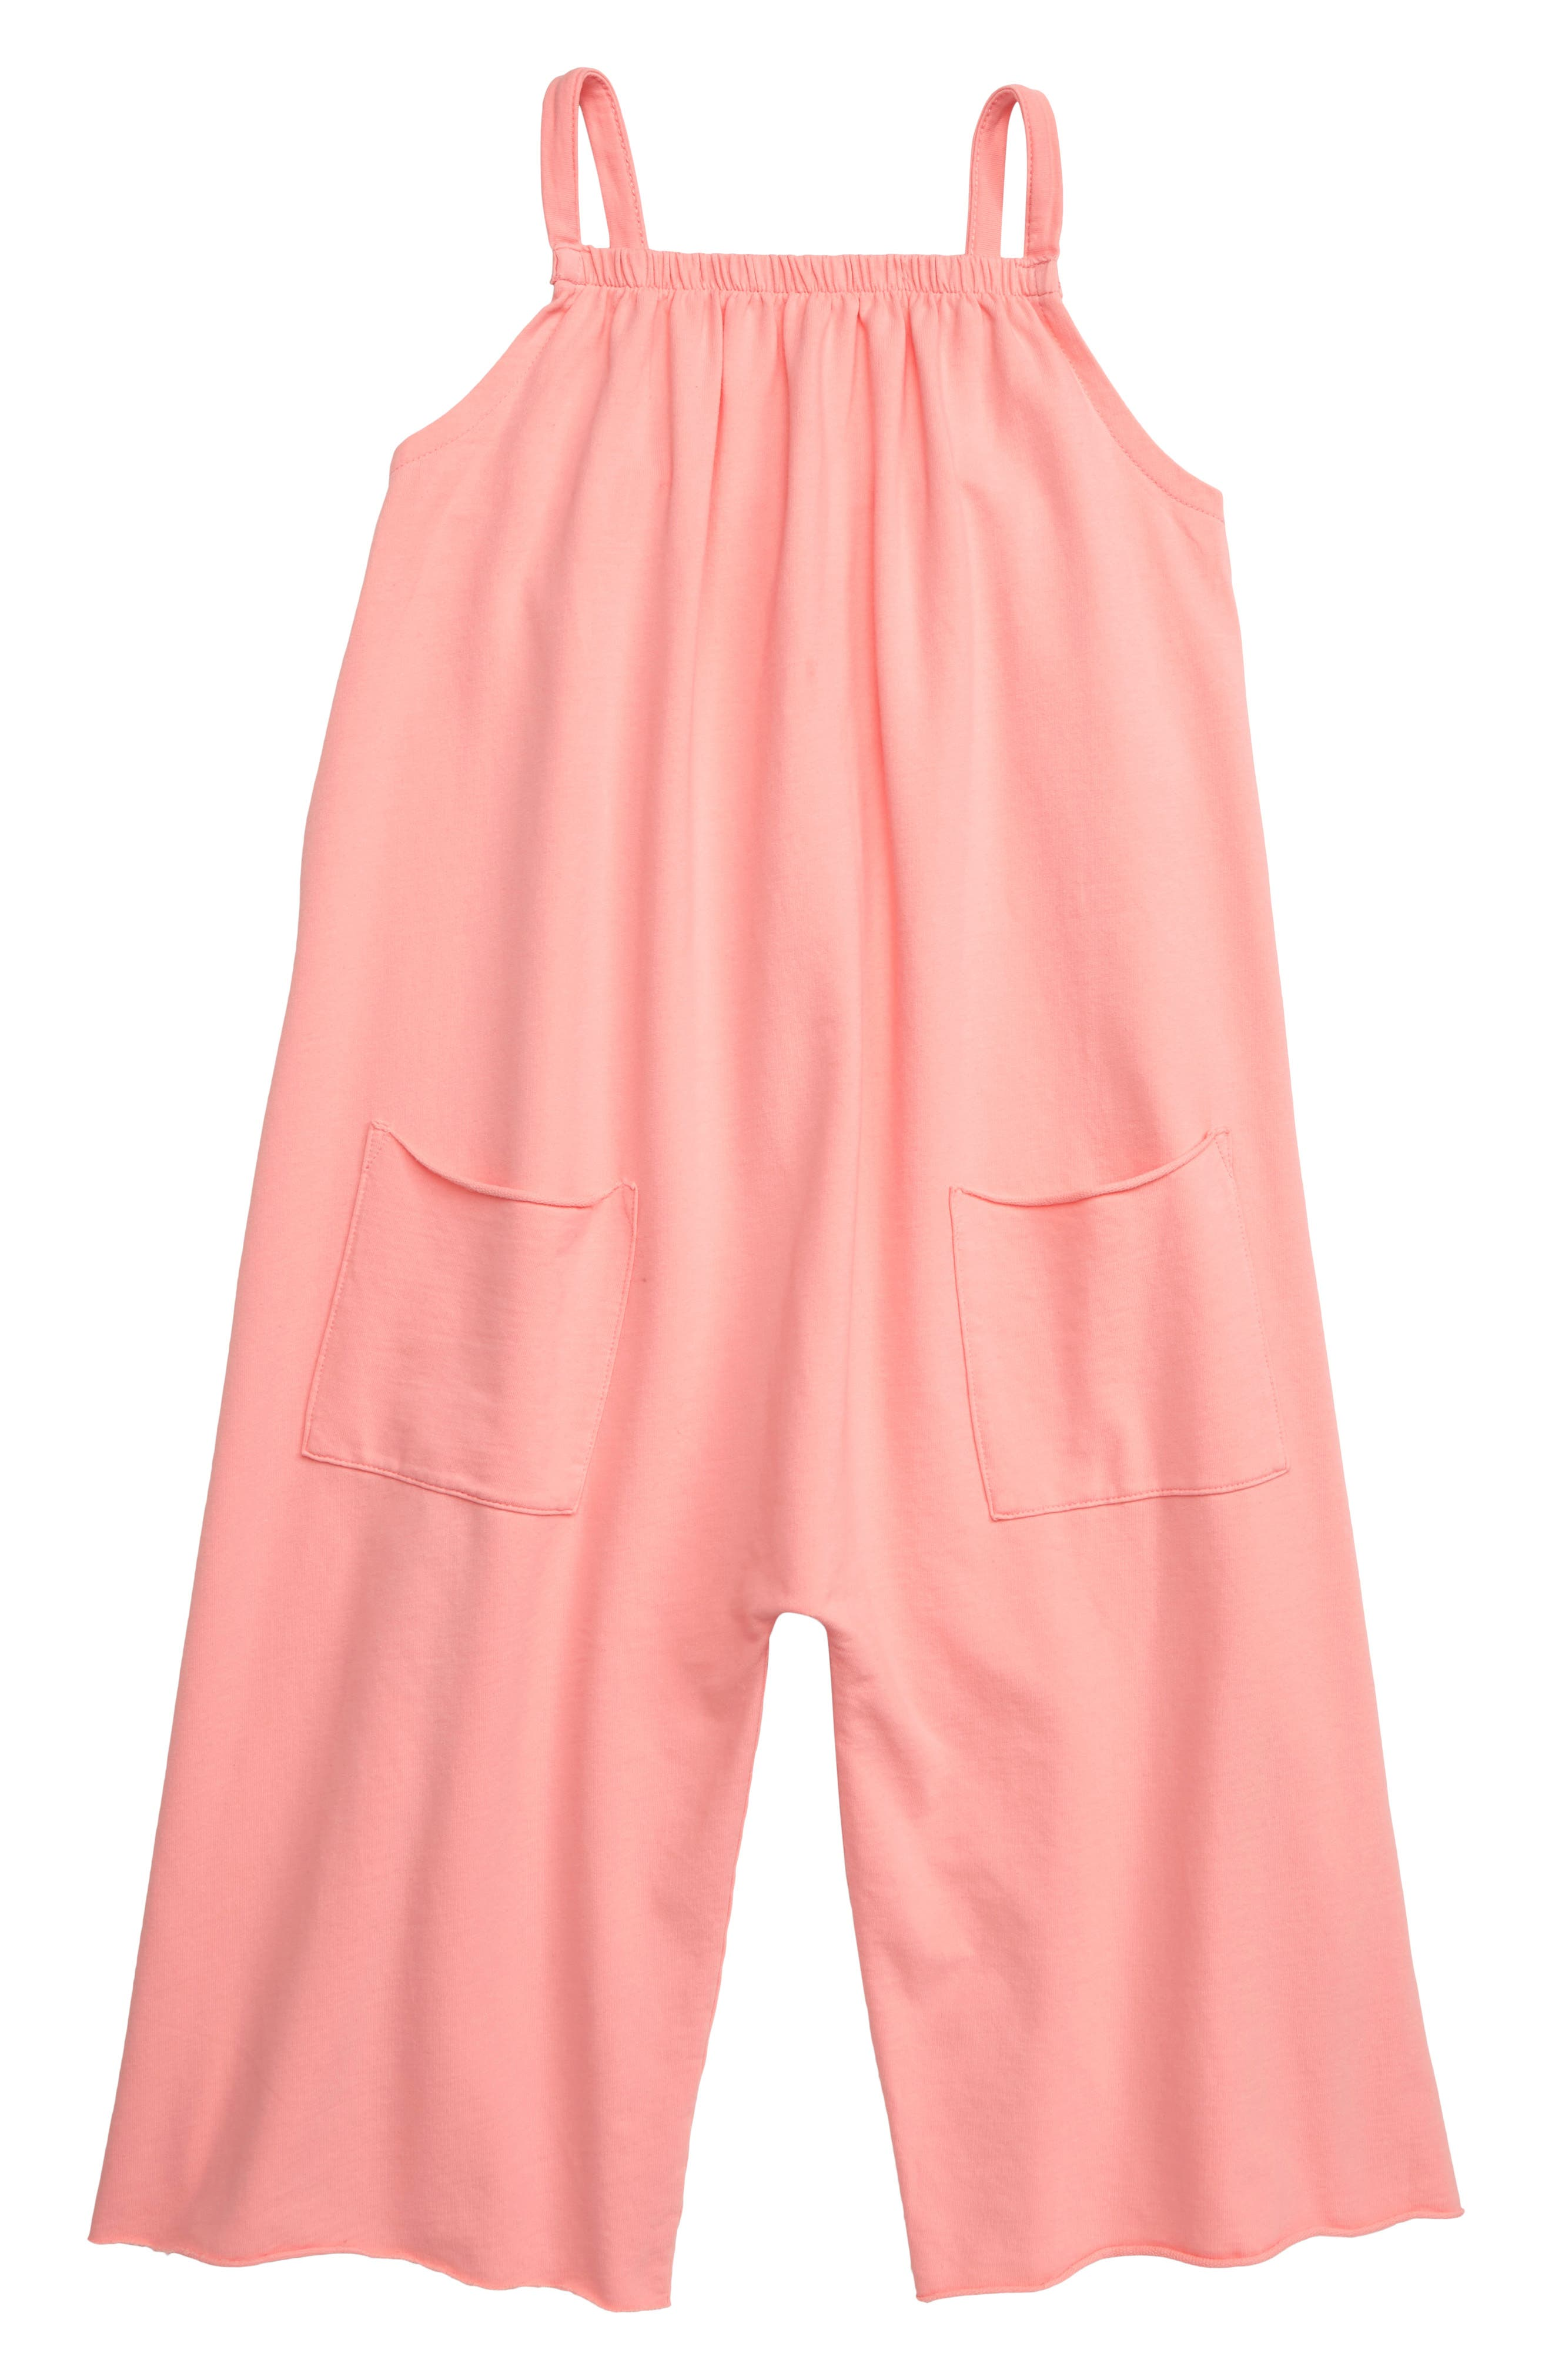 Toddler Girls Stem Gaucho Jumpsuit Size 3T  Pink